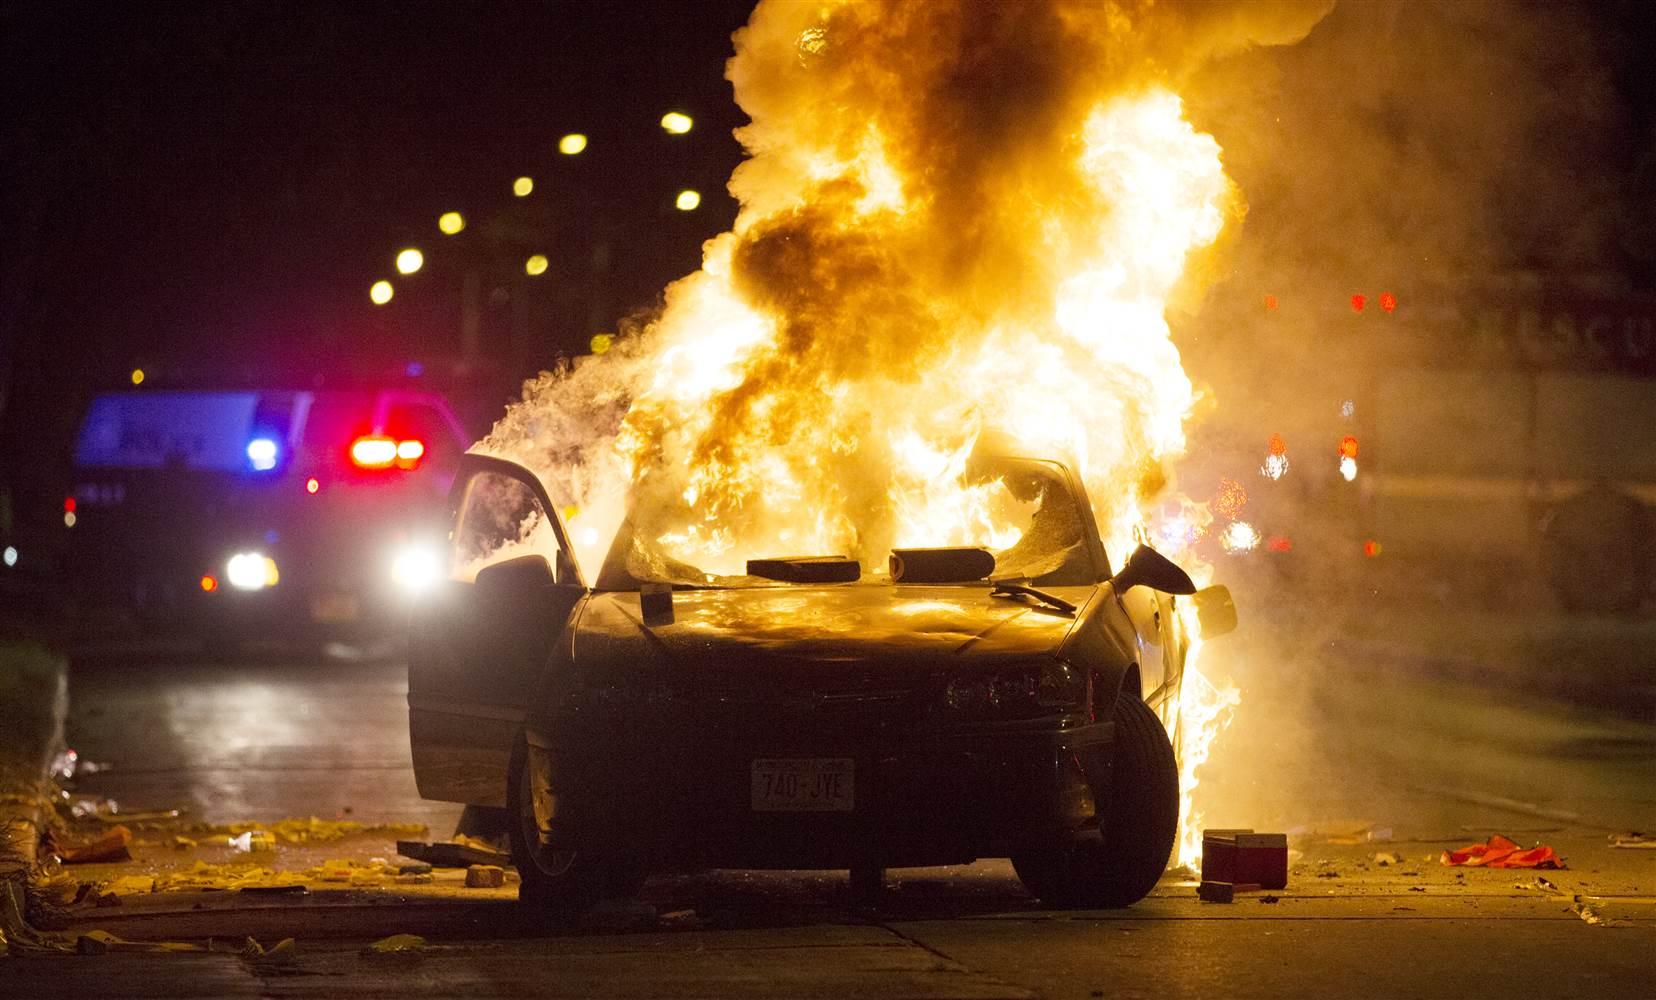 A scene from riots in Milwaukee on Aug. 13, 2016;  Photo: Calvin Mattheis/Milwaukee Journal Sentinel